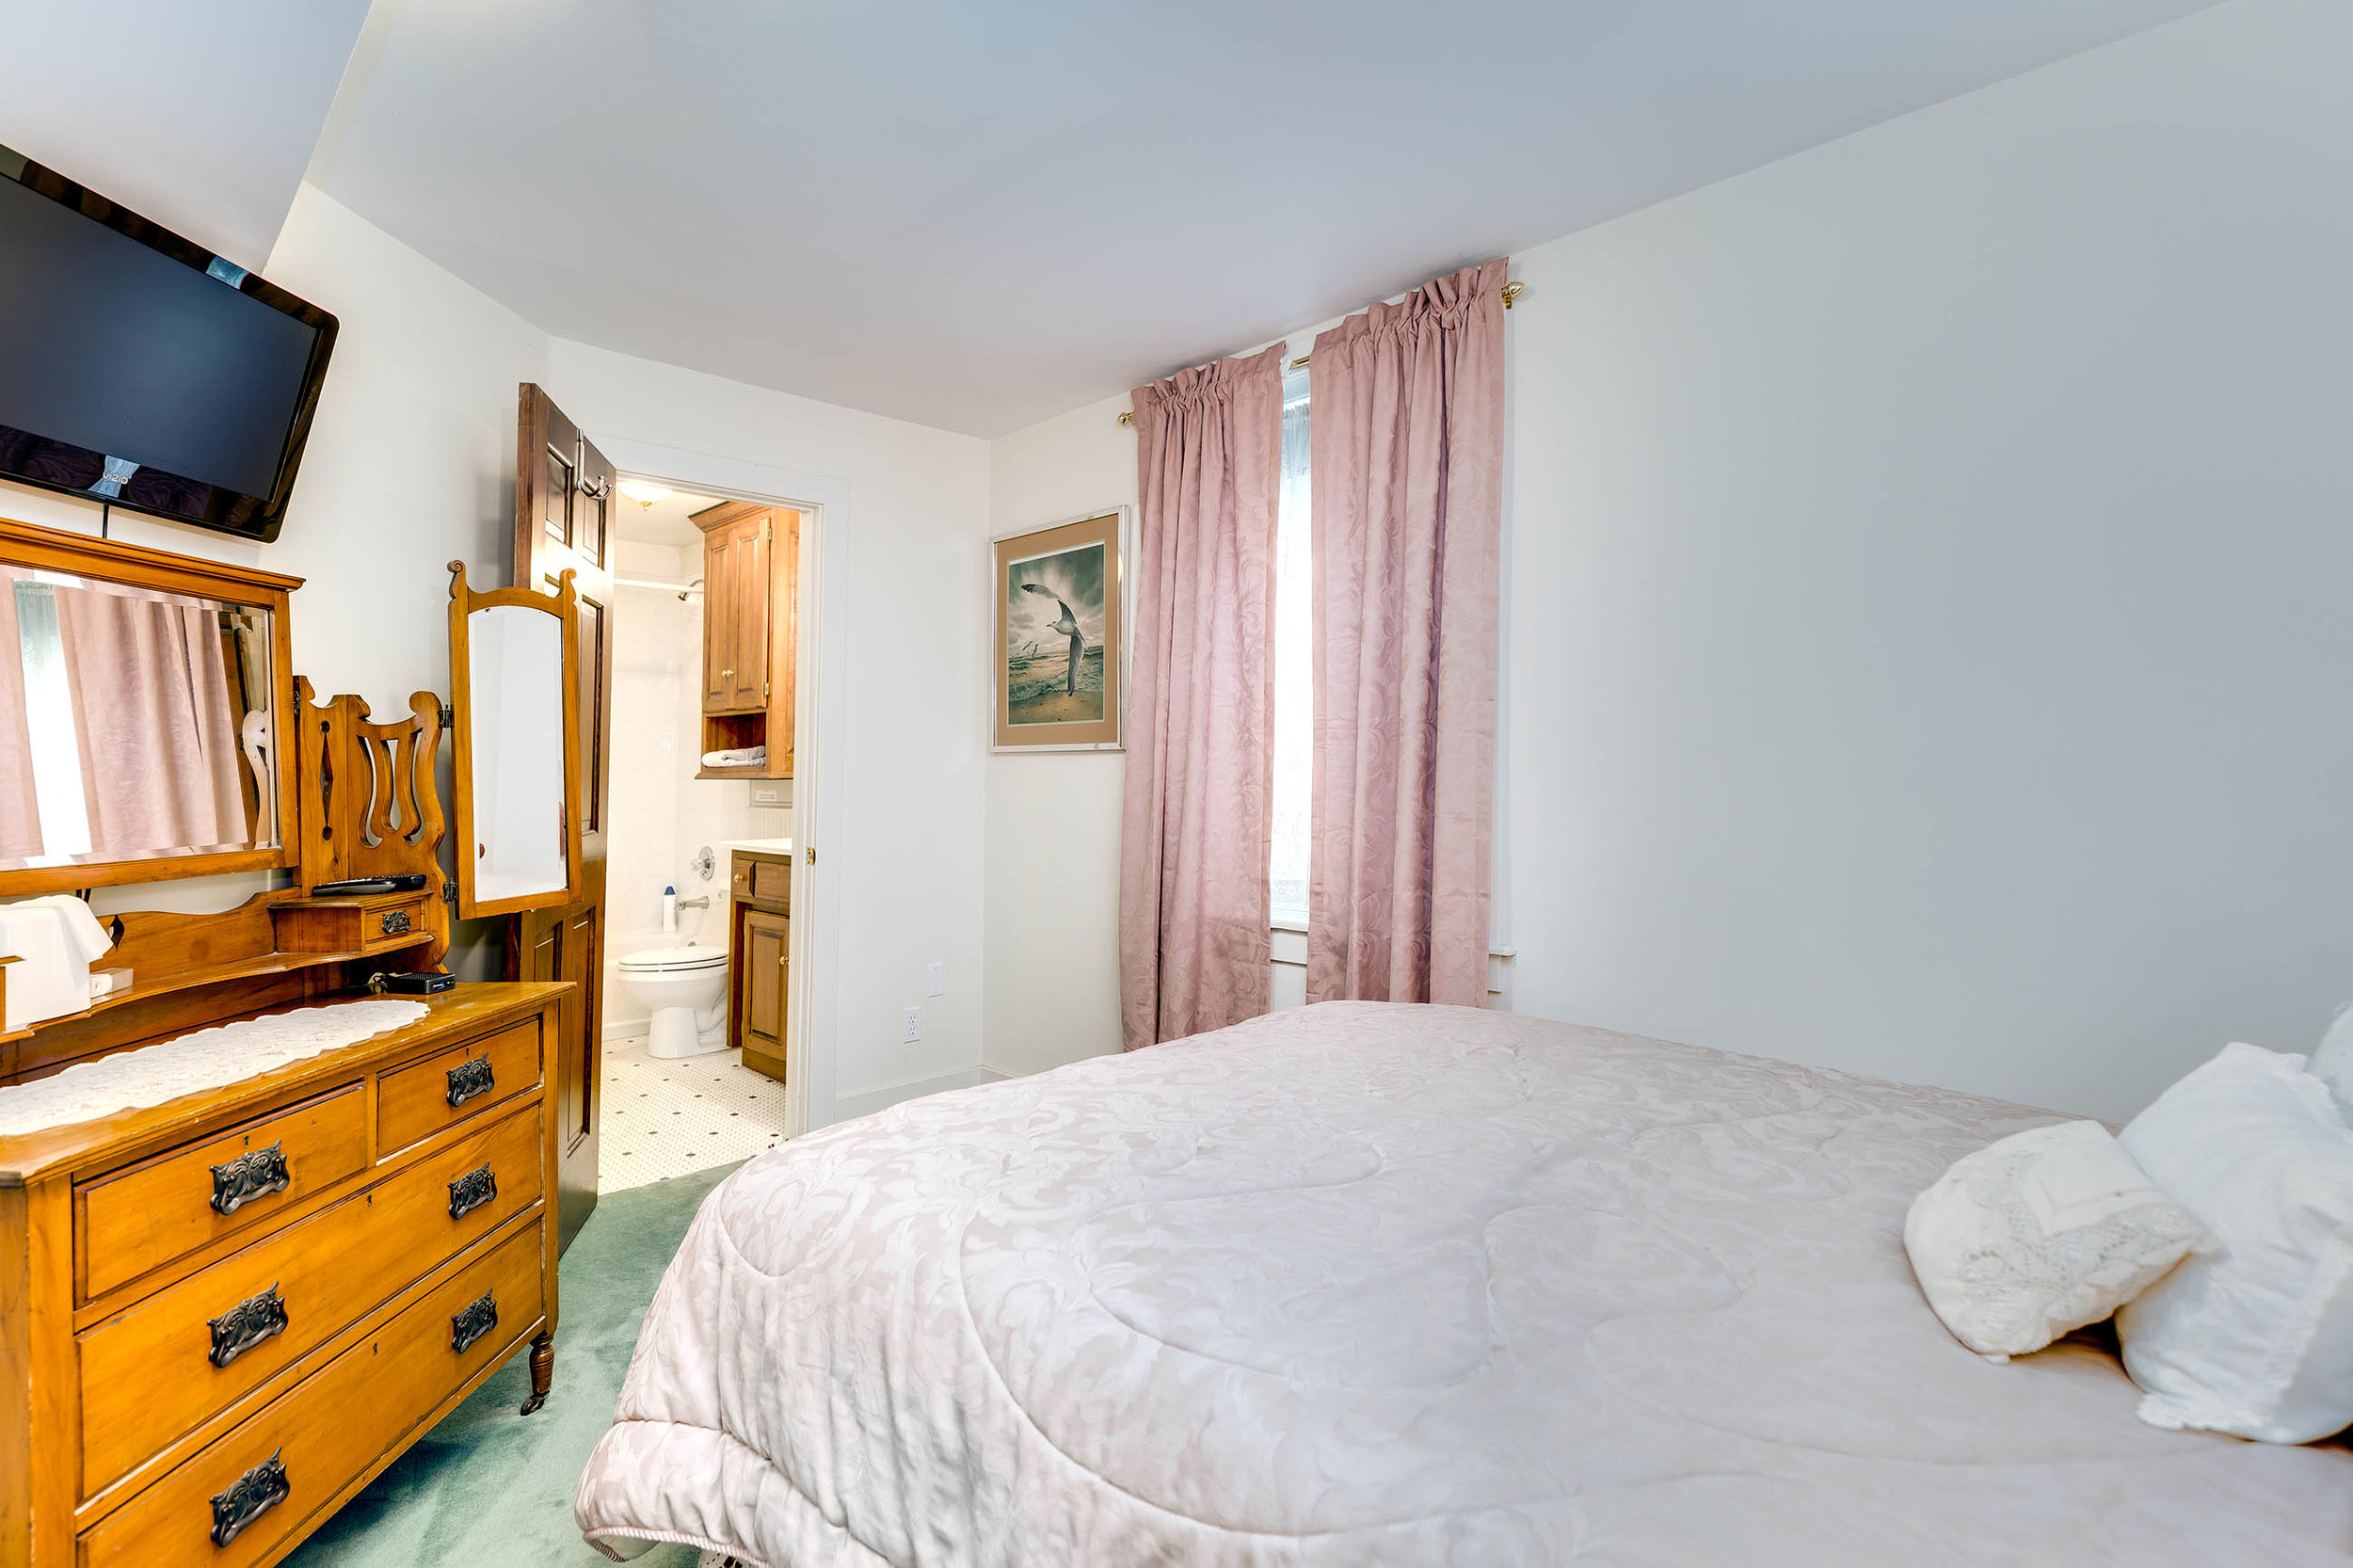 Bedroom (and full bathroom) - Lower Level